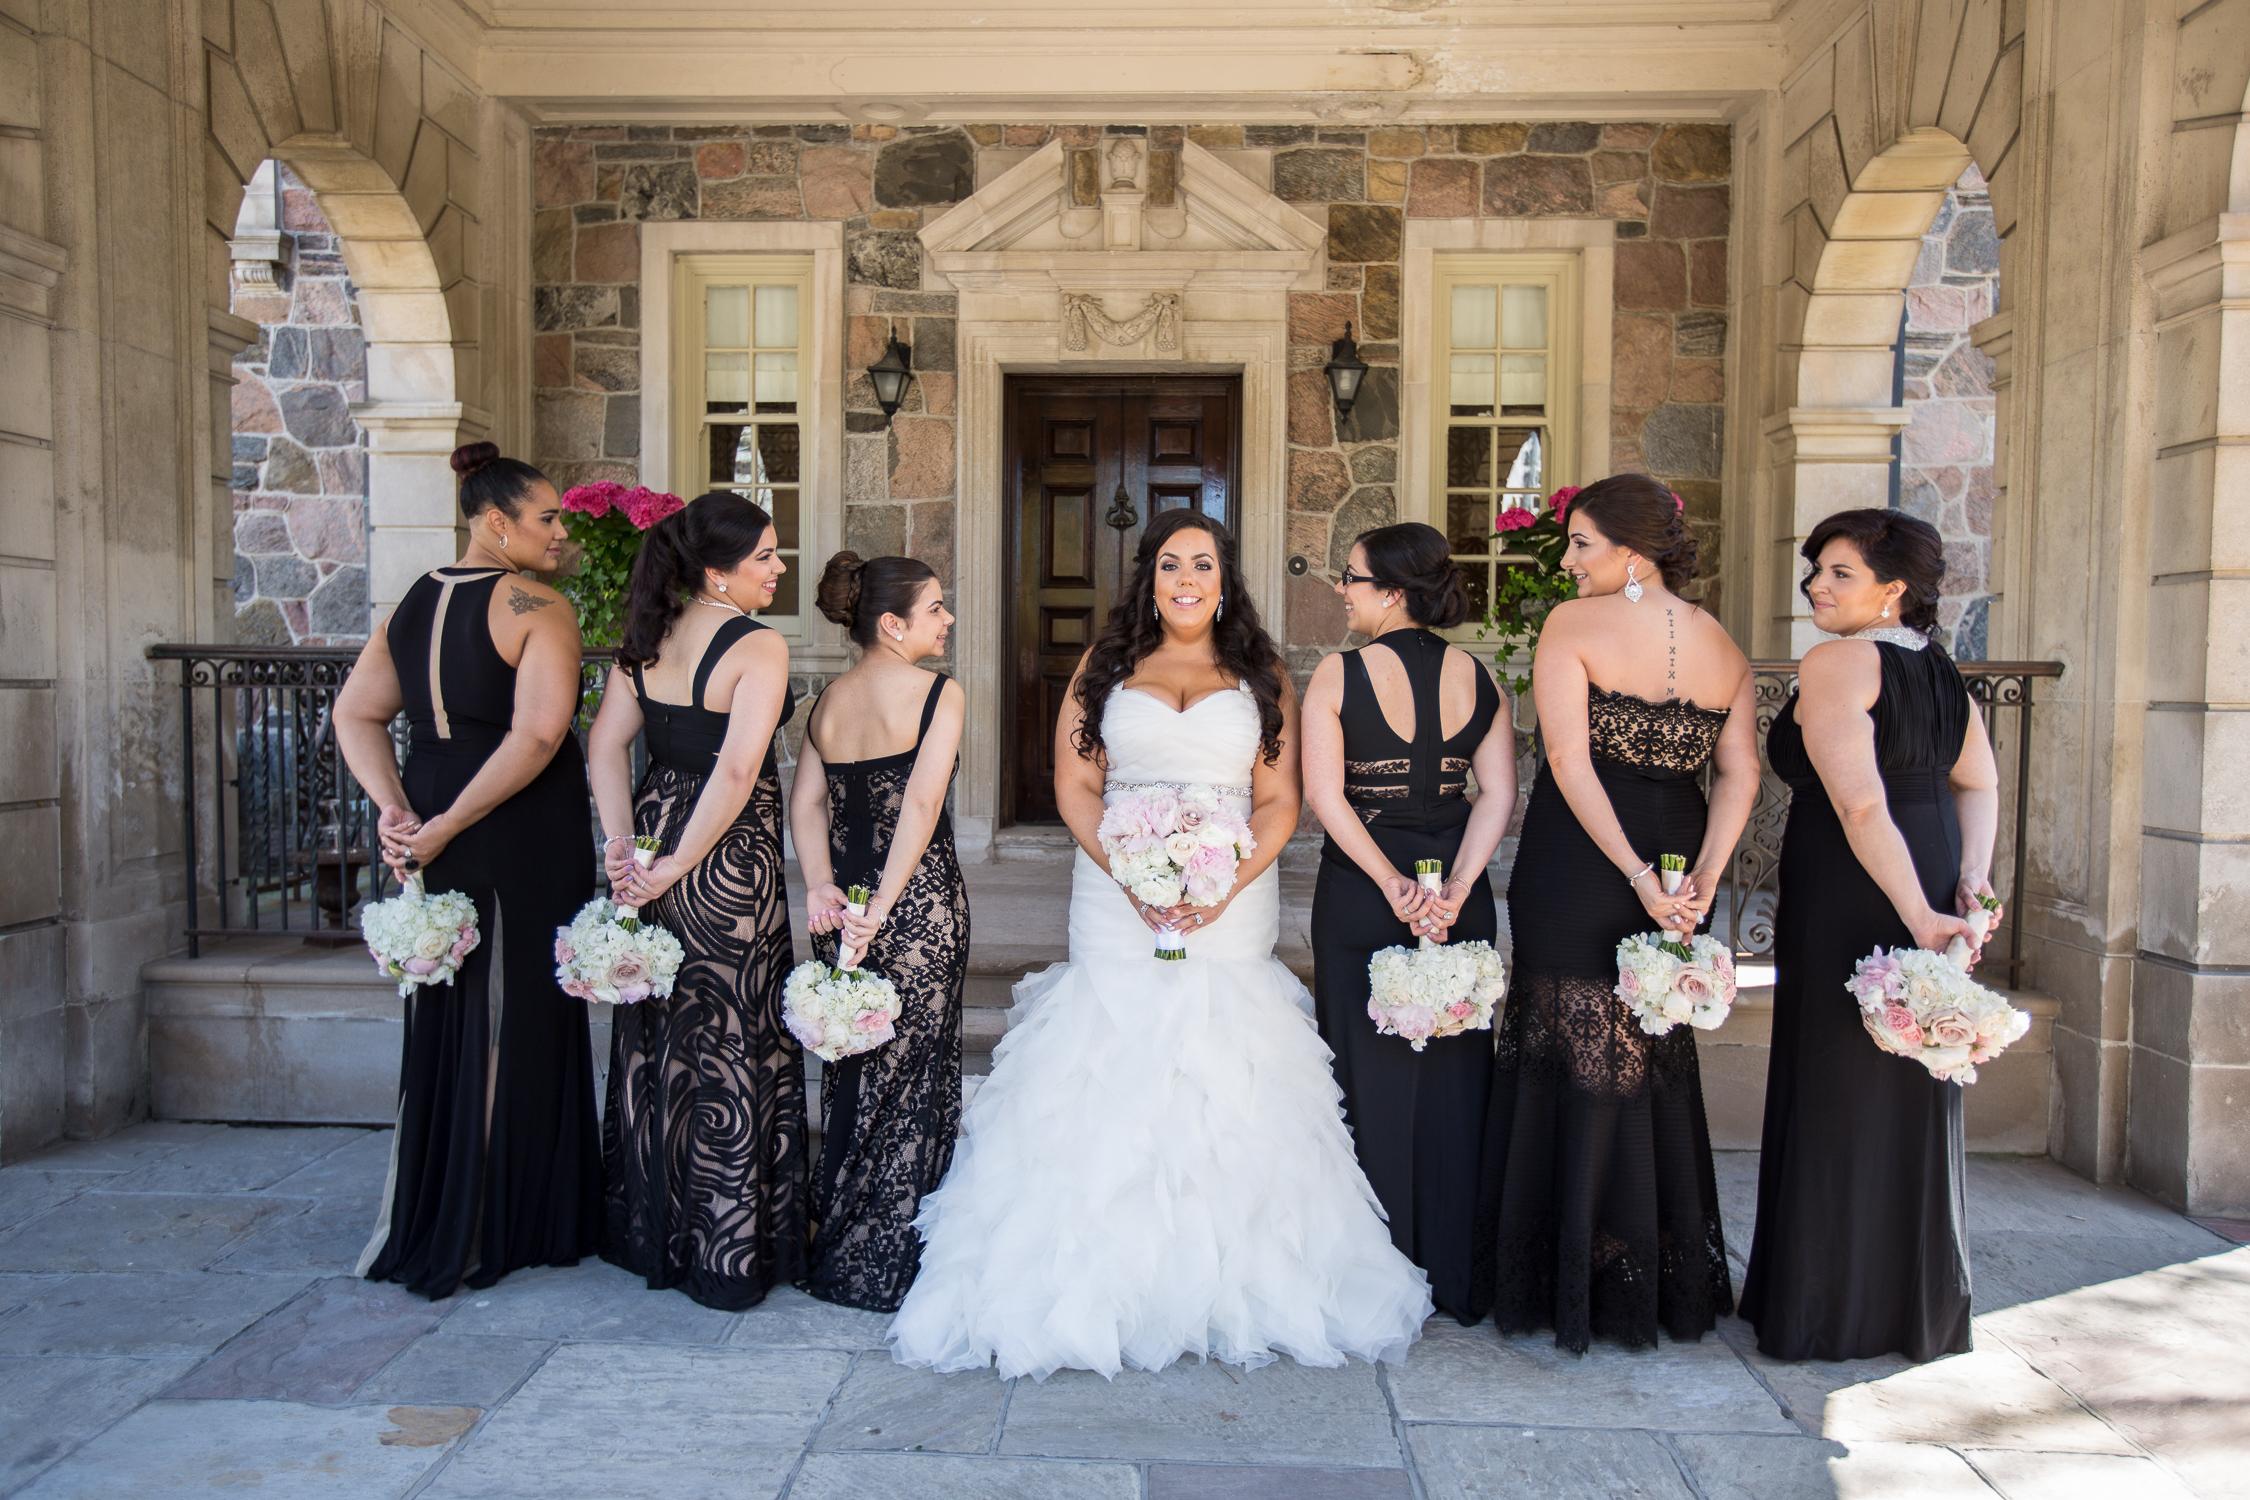 Peter-and-Marie-Wedding-Fontana-Primavera-Graydon-Hall-Manor-Toronto-Ontario-Canada-0025.jpg